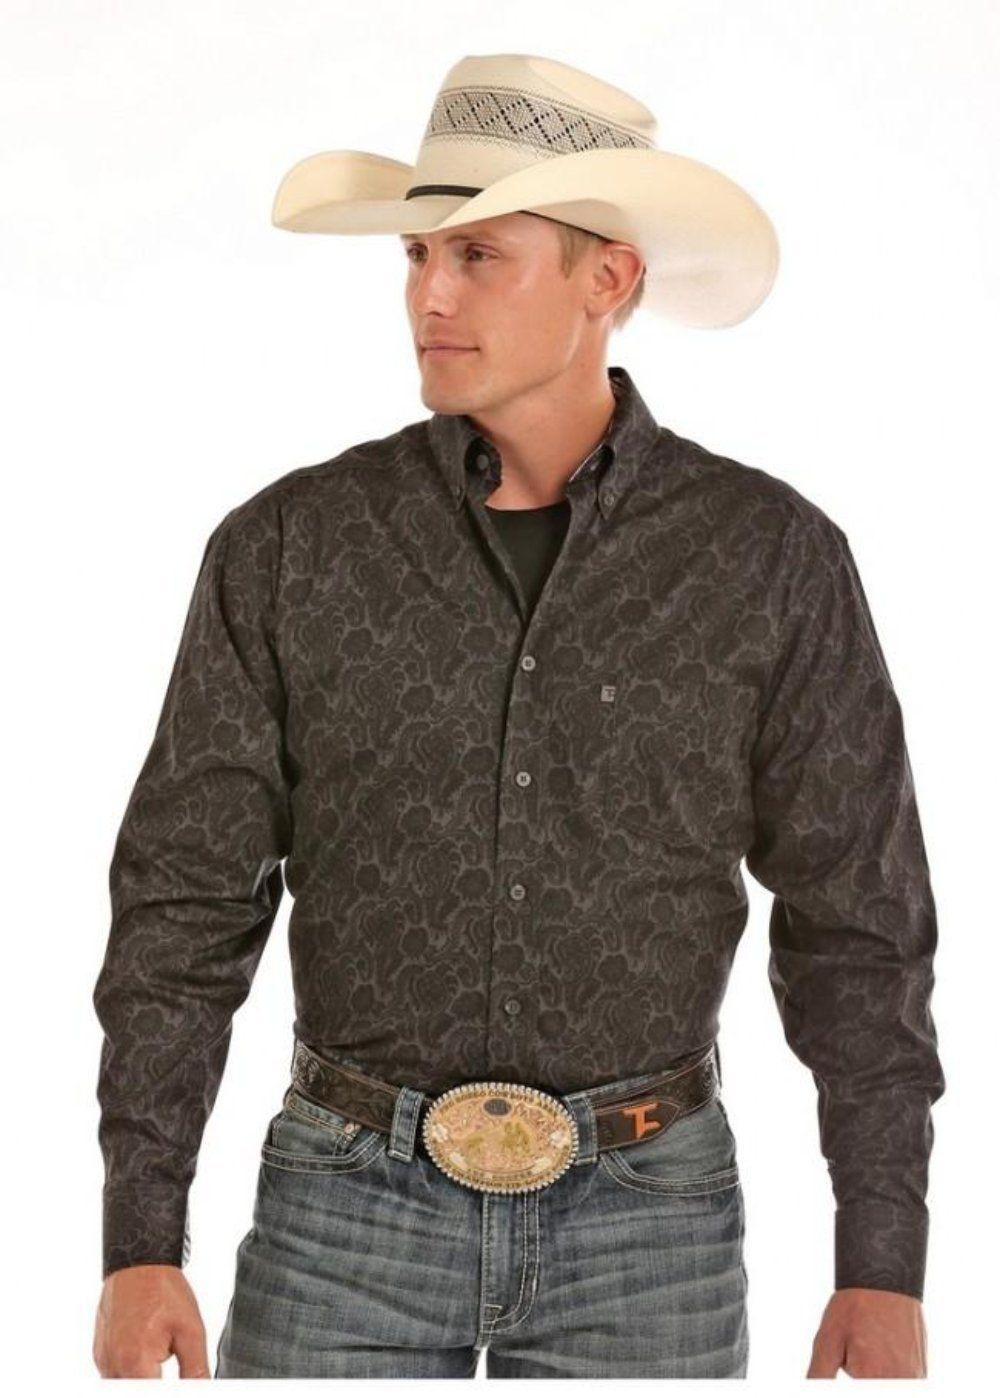 8882c0ab3 Panhandle Tuf Cooper Men's L/S Black Paisley Print Button Shirt ...